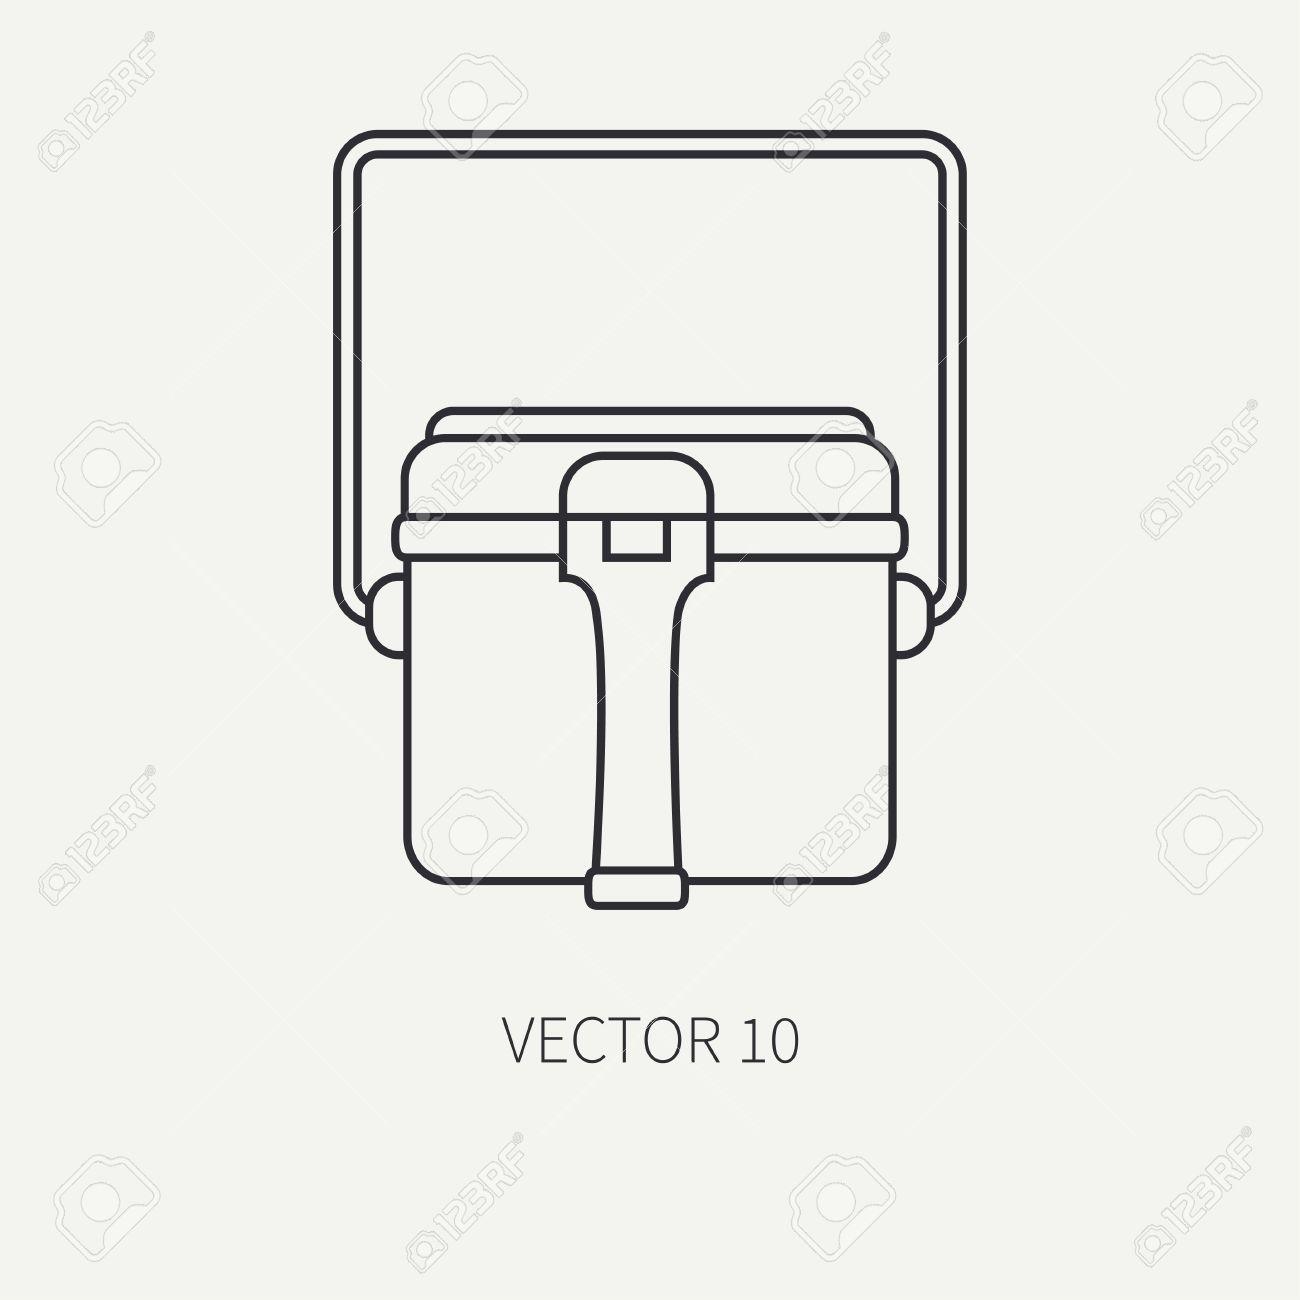 Línea De Caza De Vector Plano Y Icono De Camping - Hervidor De Agua. Equipo  De Cazador 67e8eb4058f